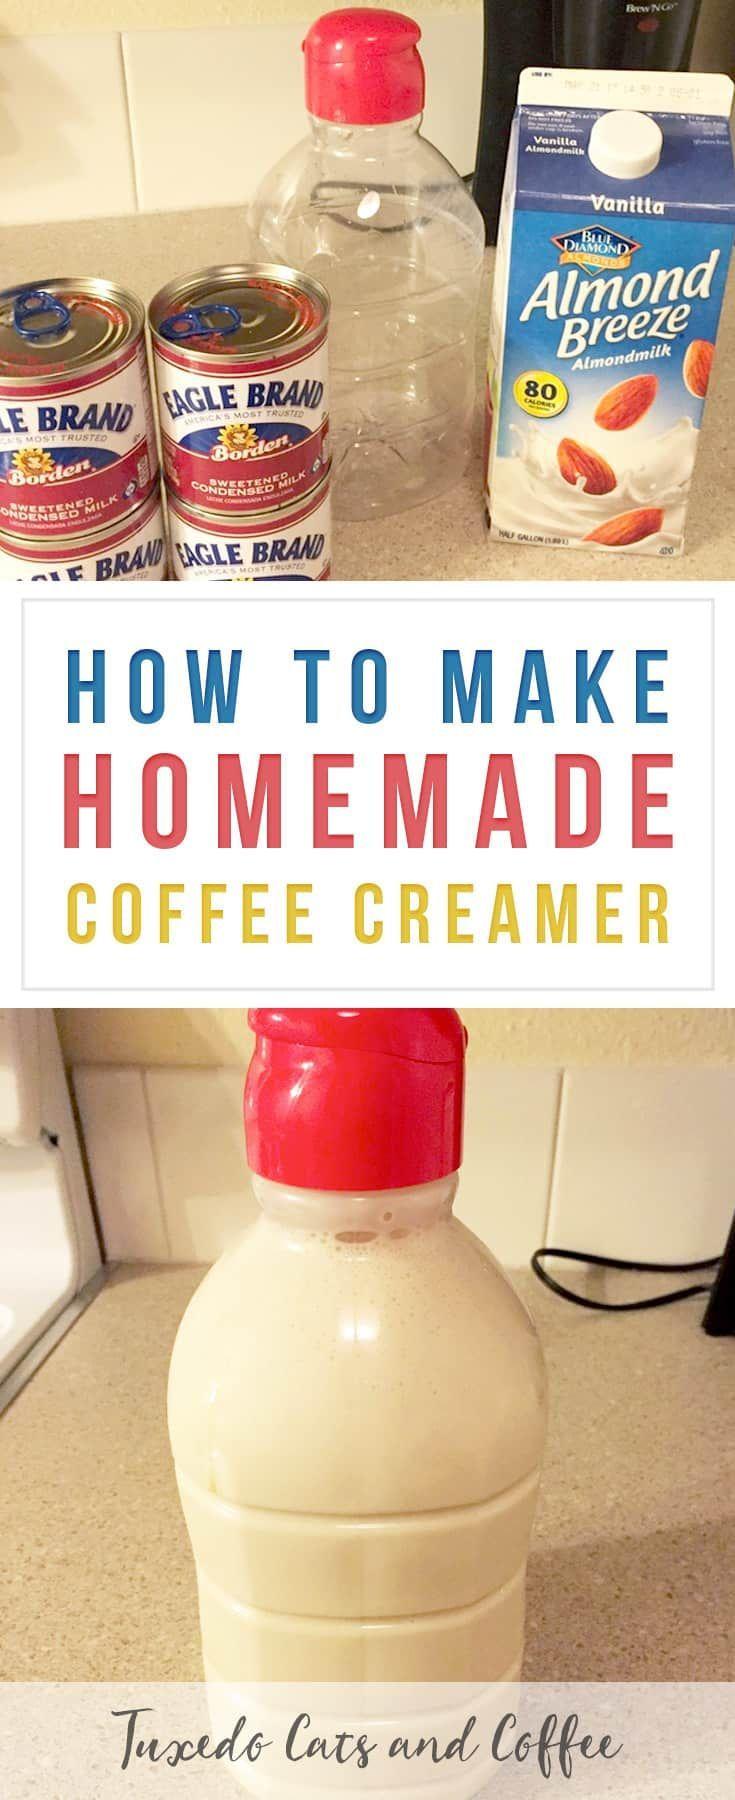 How to Make Homemade Coffee Creamer - Coffee -